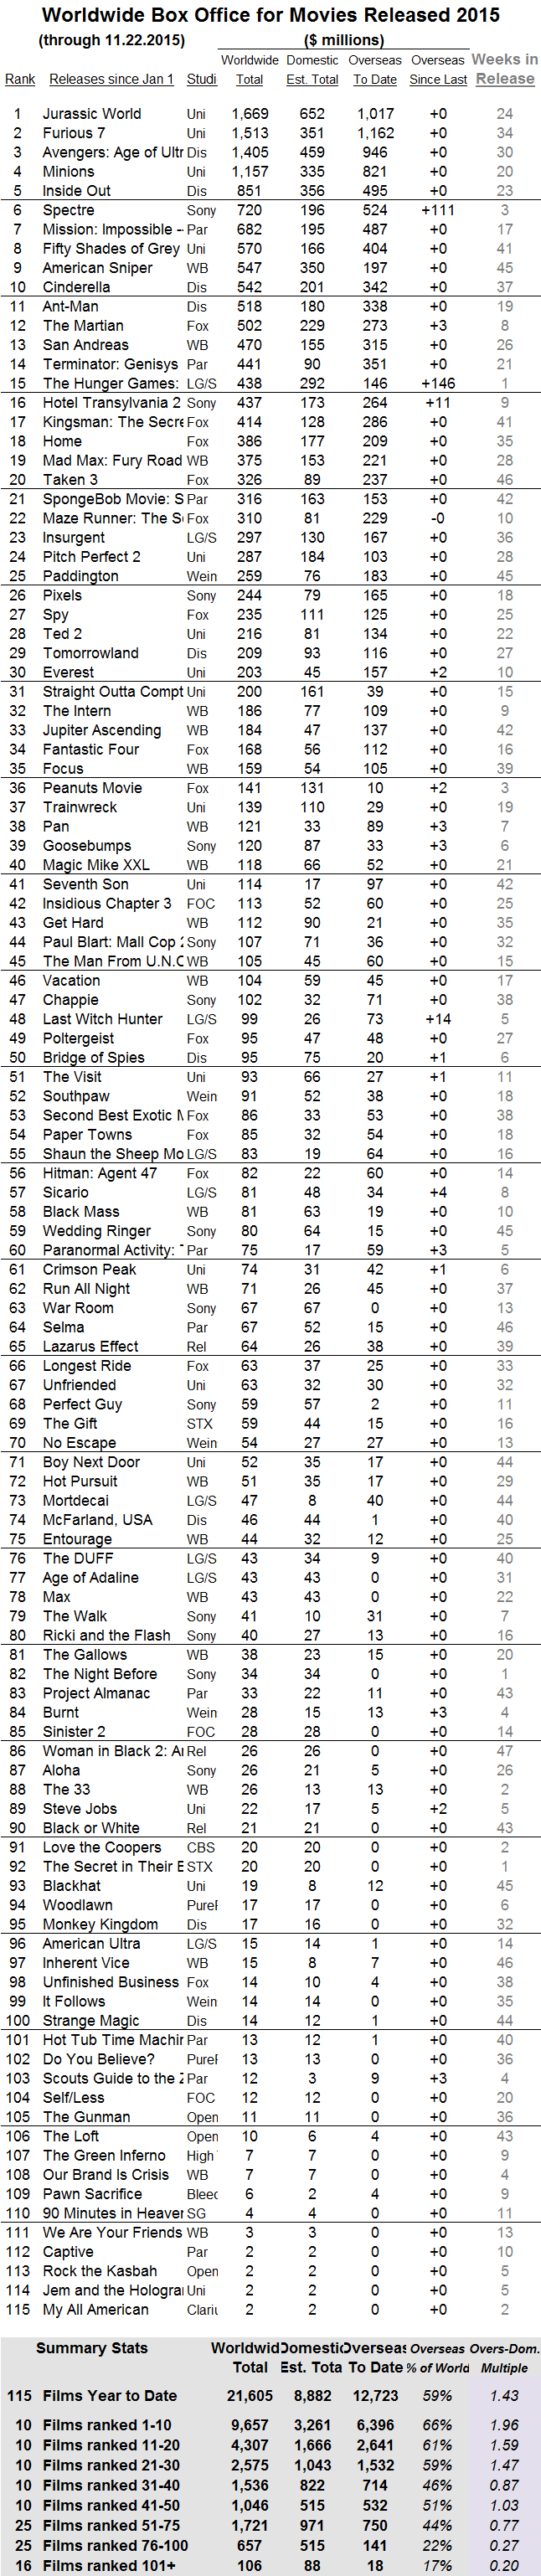 International 2015 through 2015 Nov 22